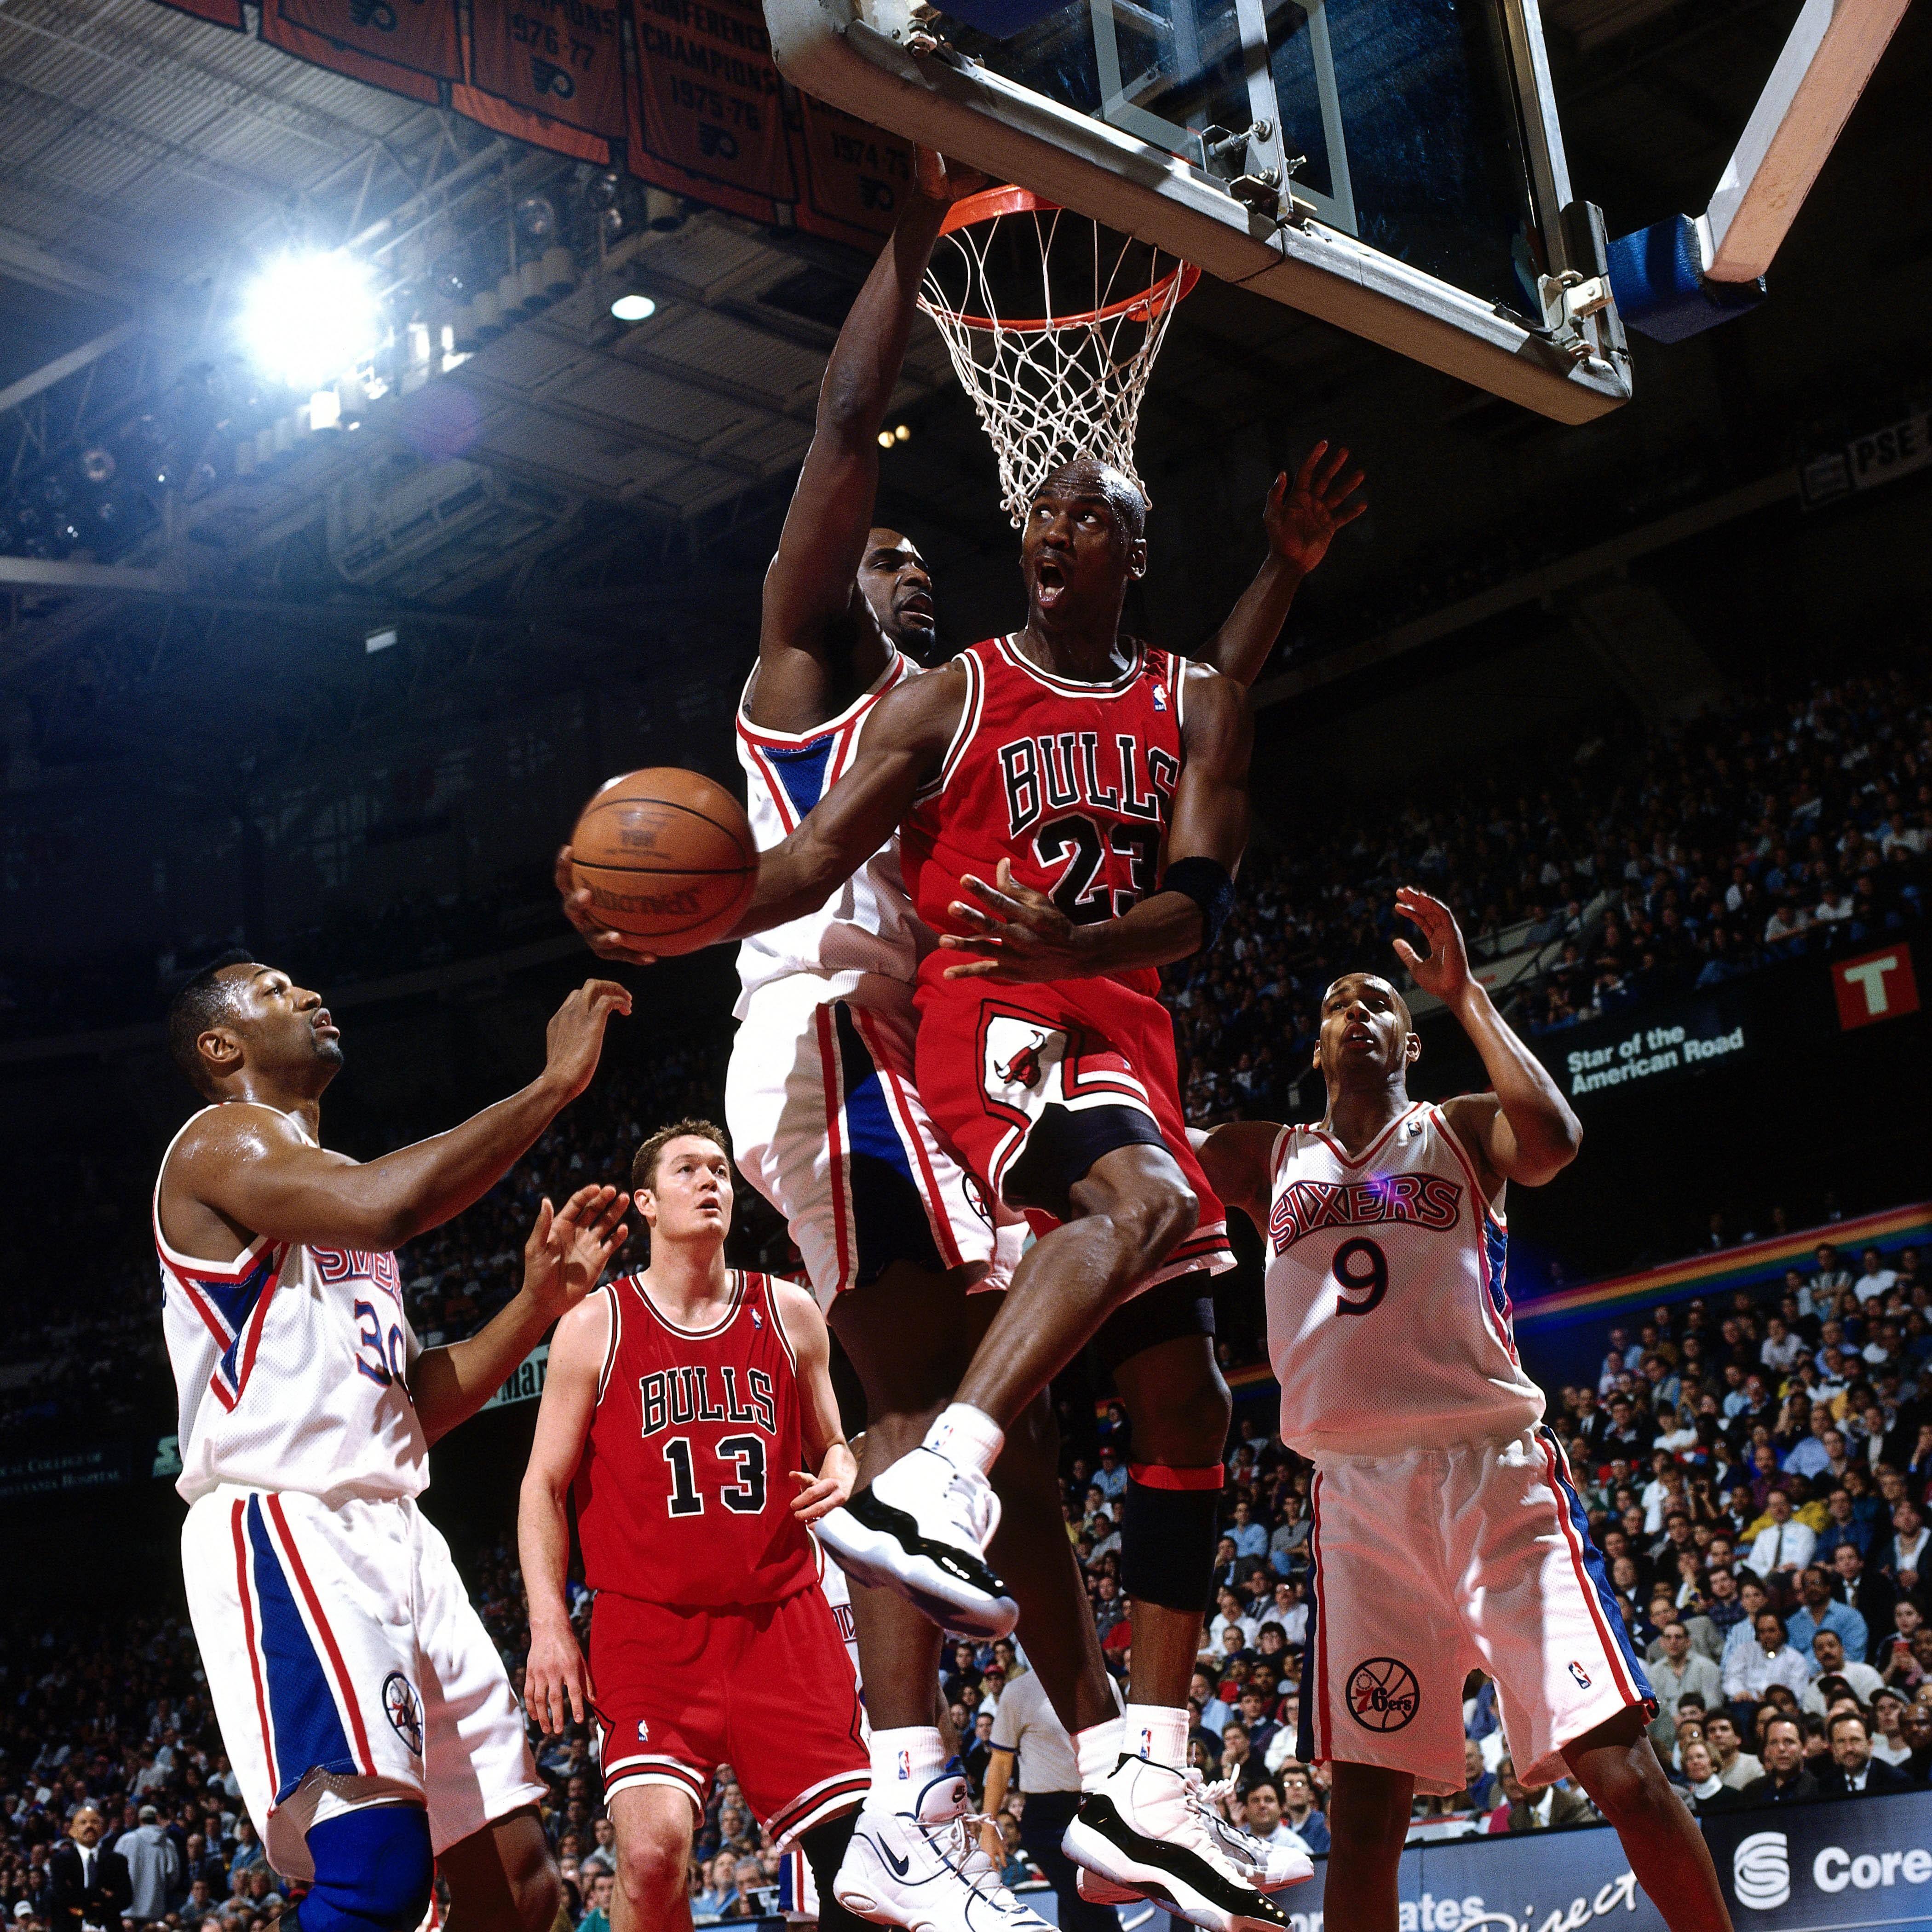 Wallpaper : Men, Sports, Legend, NBA, Chicago Bulls